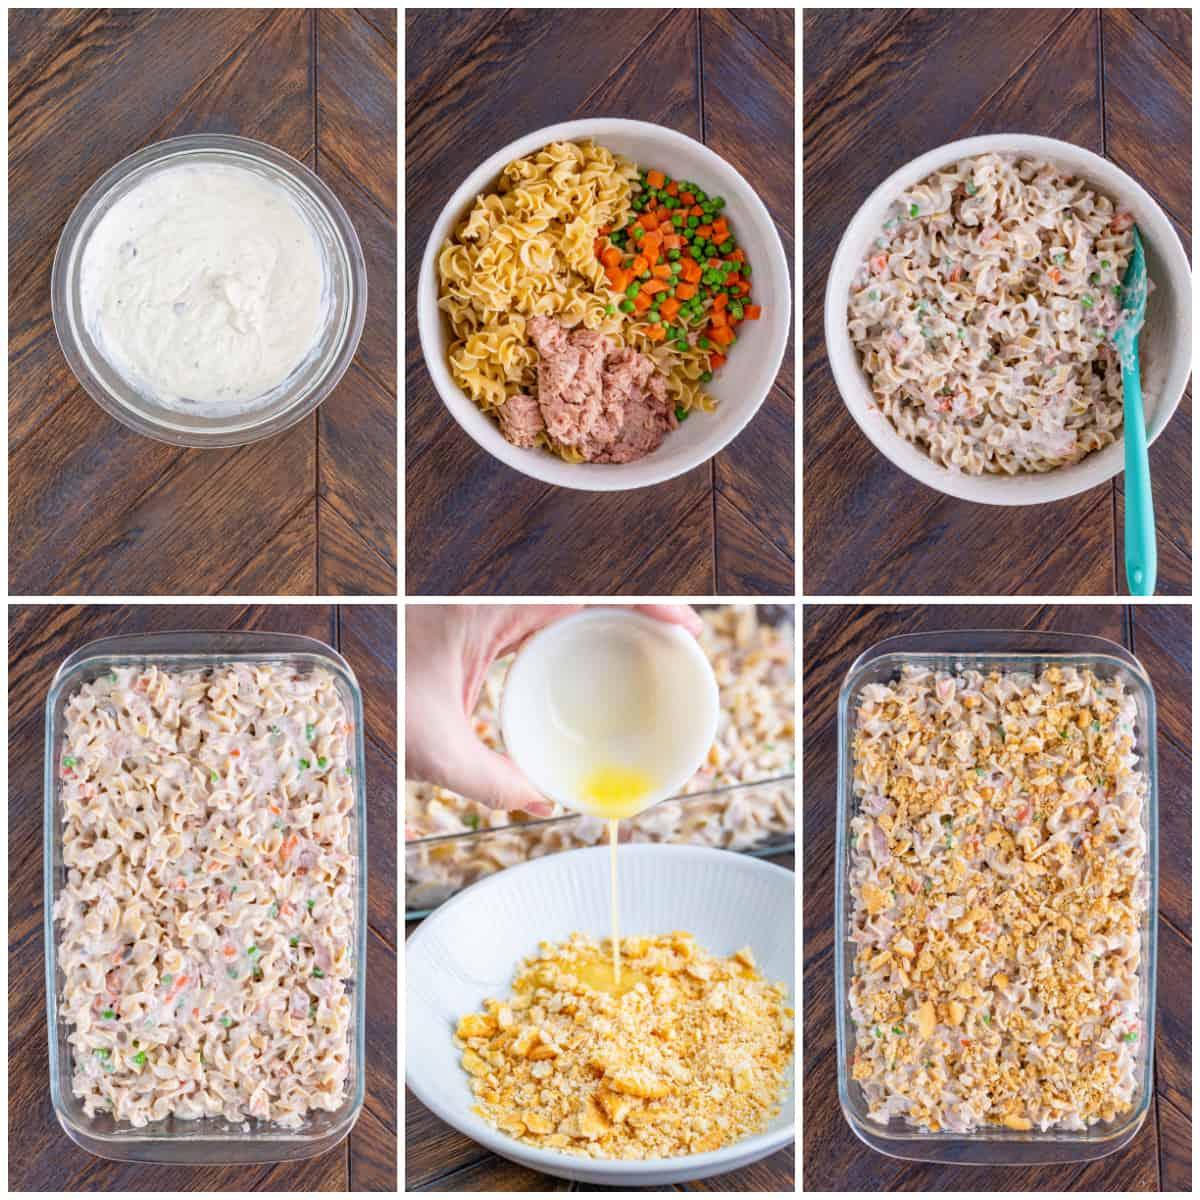 Step by step photos on how to make a Tuna Noodle Casserole Recipe.